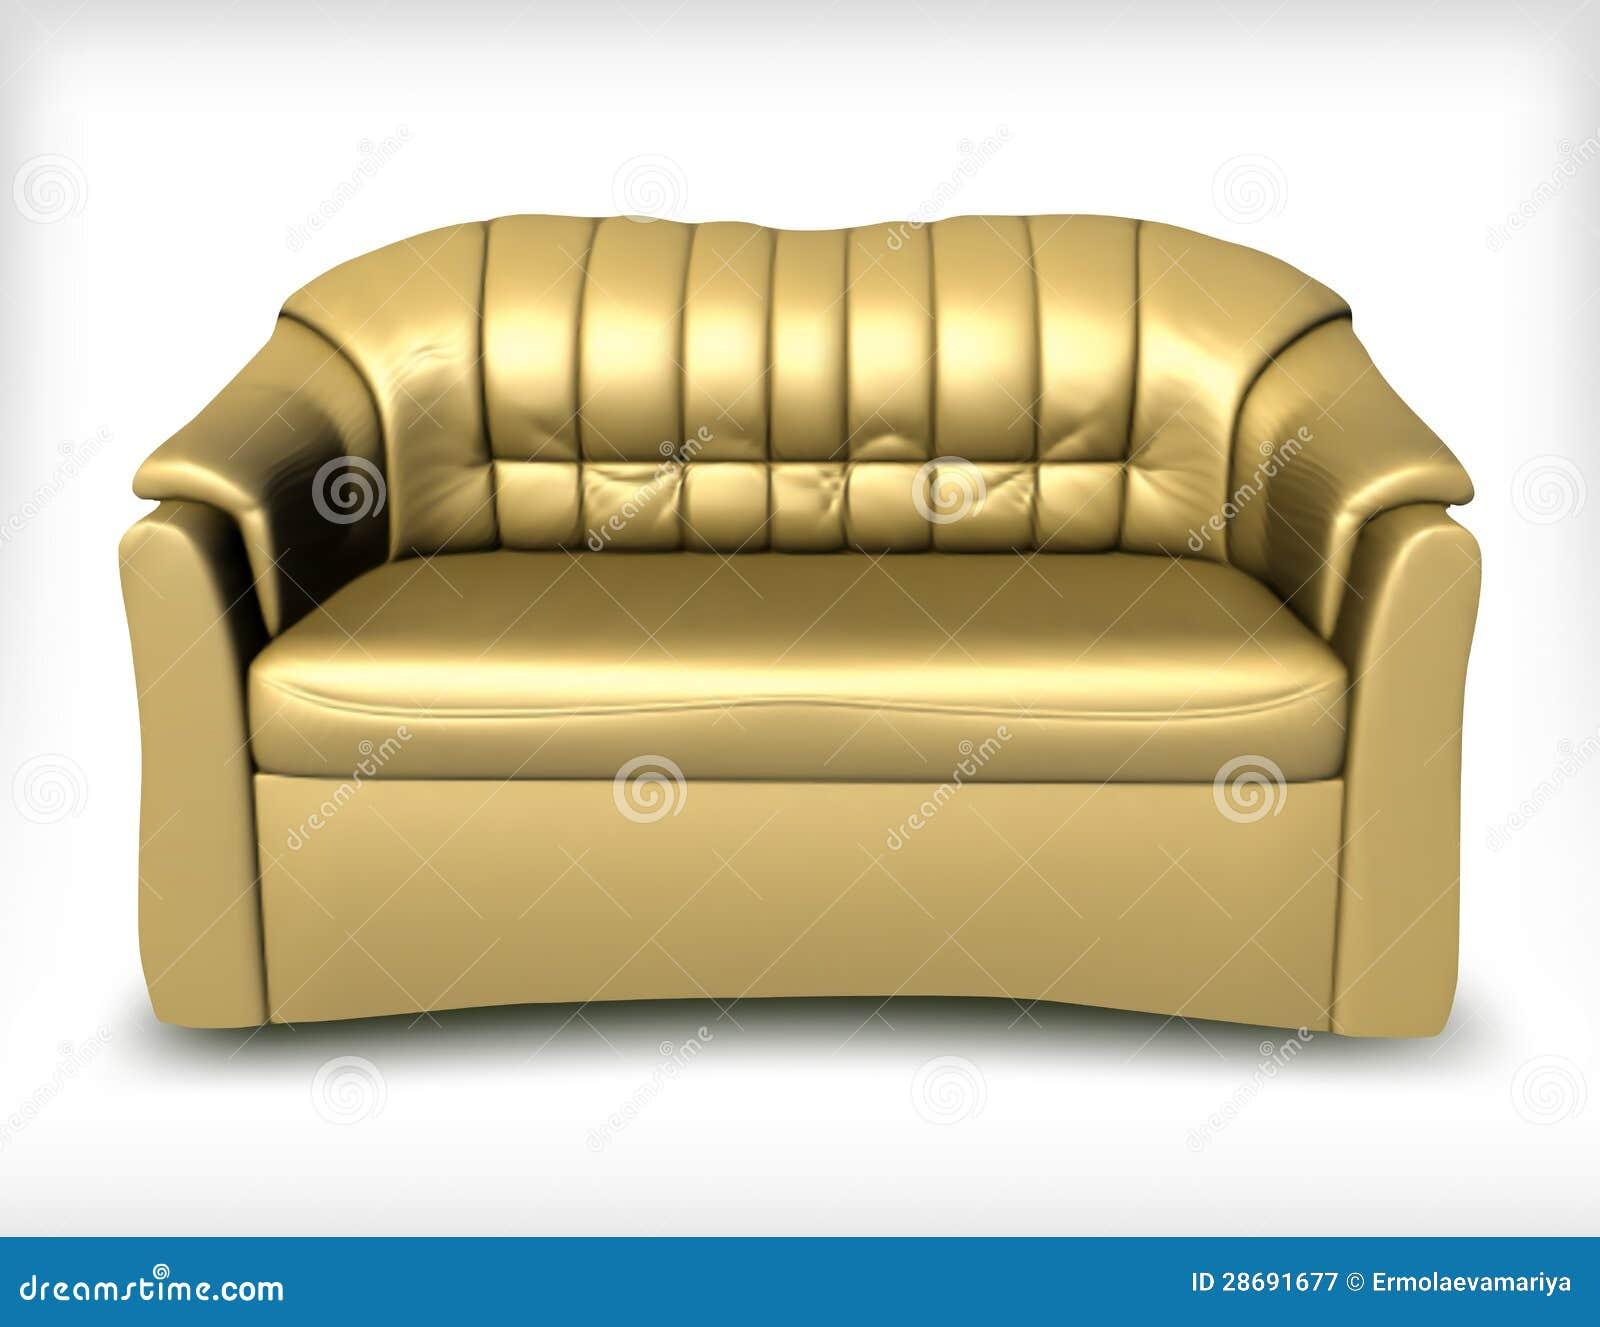 Golden Leather Sofa. Vector